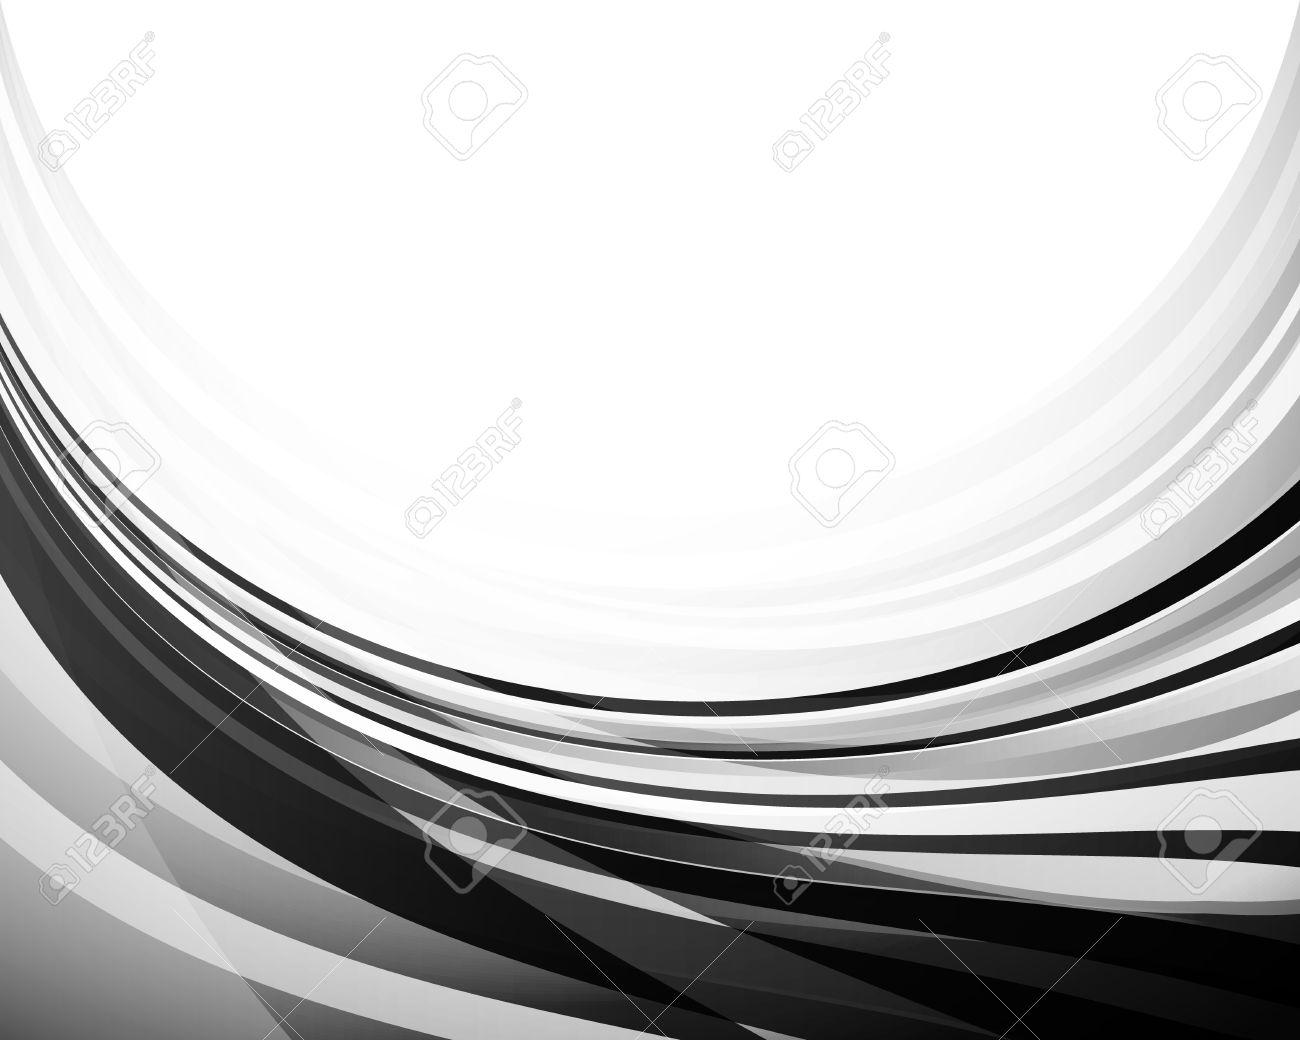 fondo de escala de grises foto de archivo